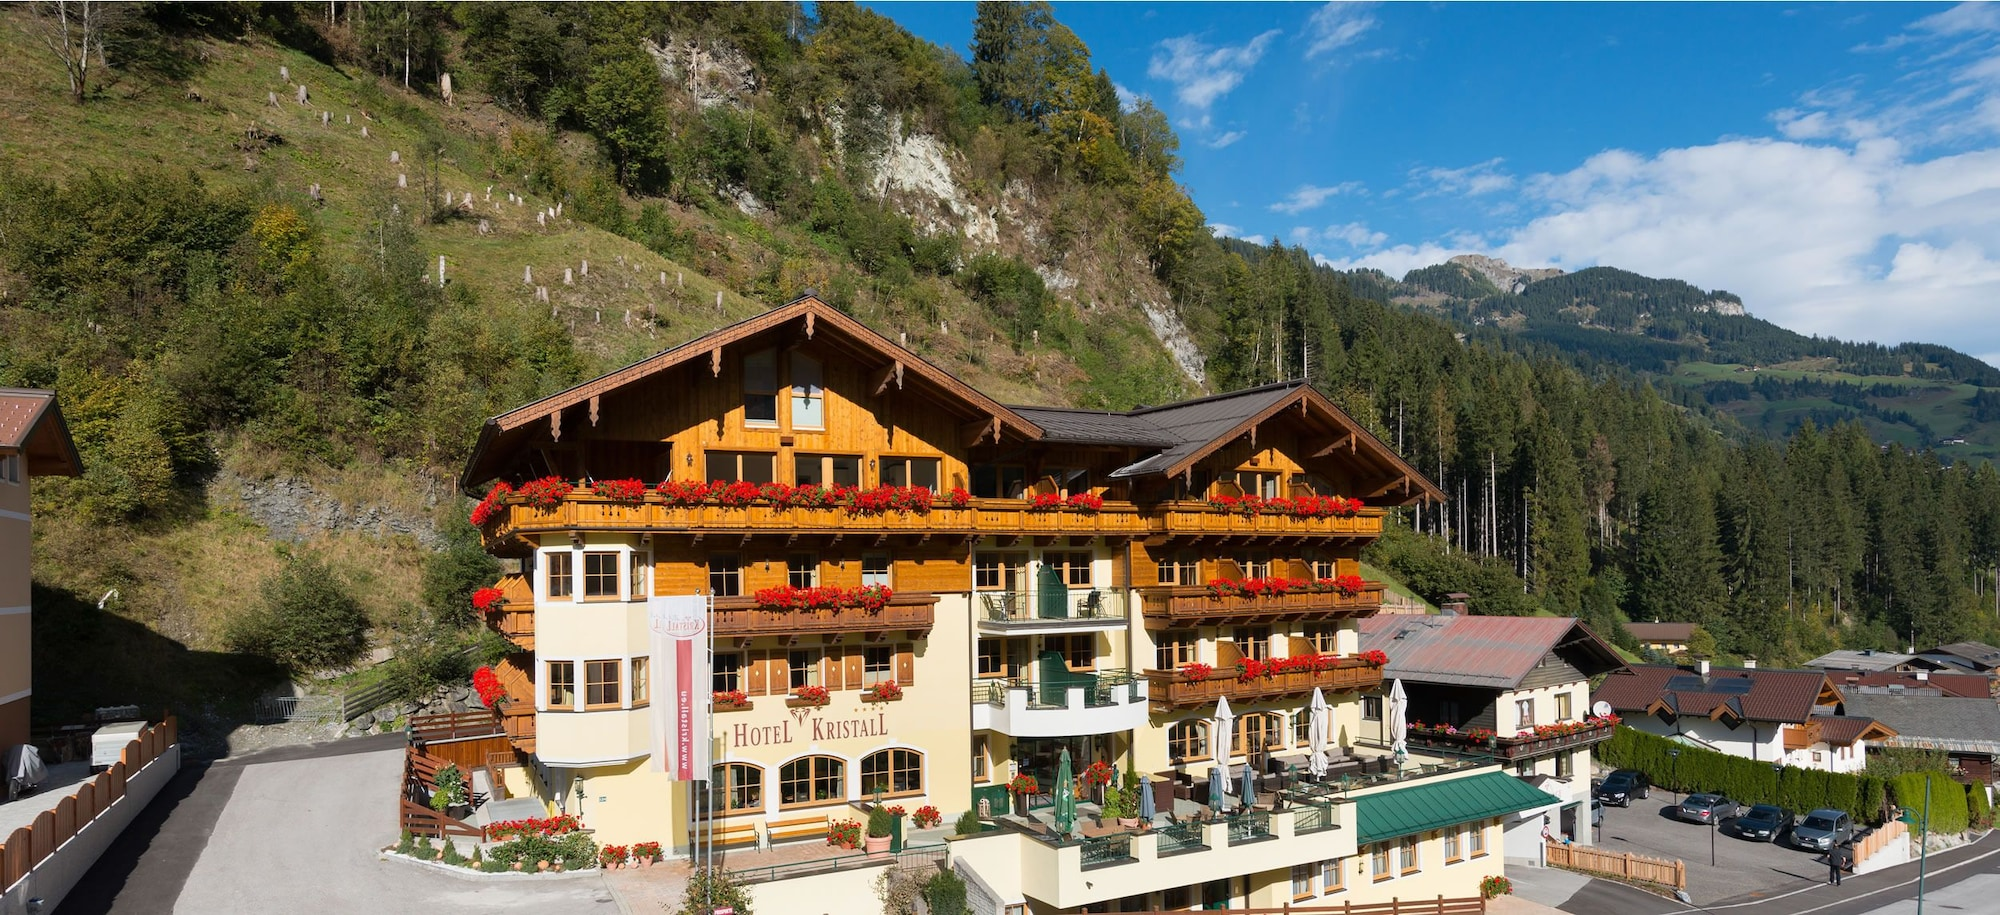 Hotel Kristall, Sankt Johann im Pongau